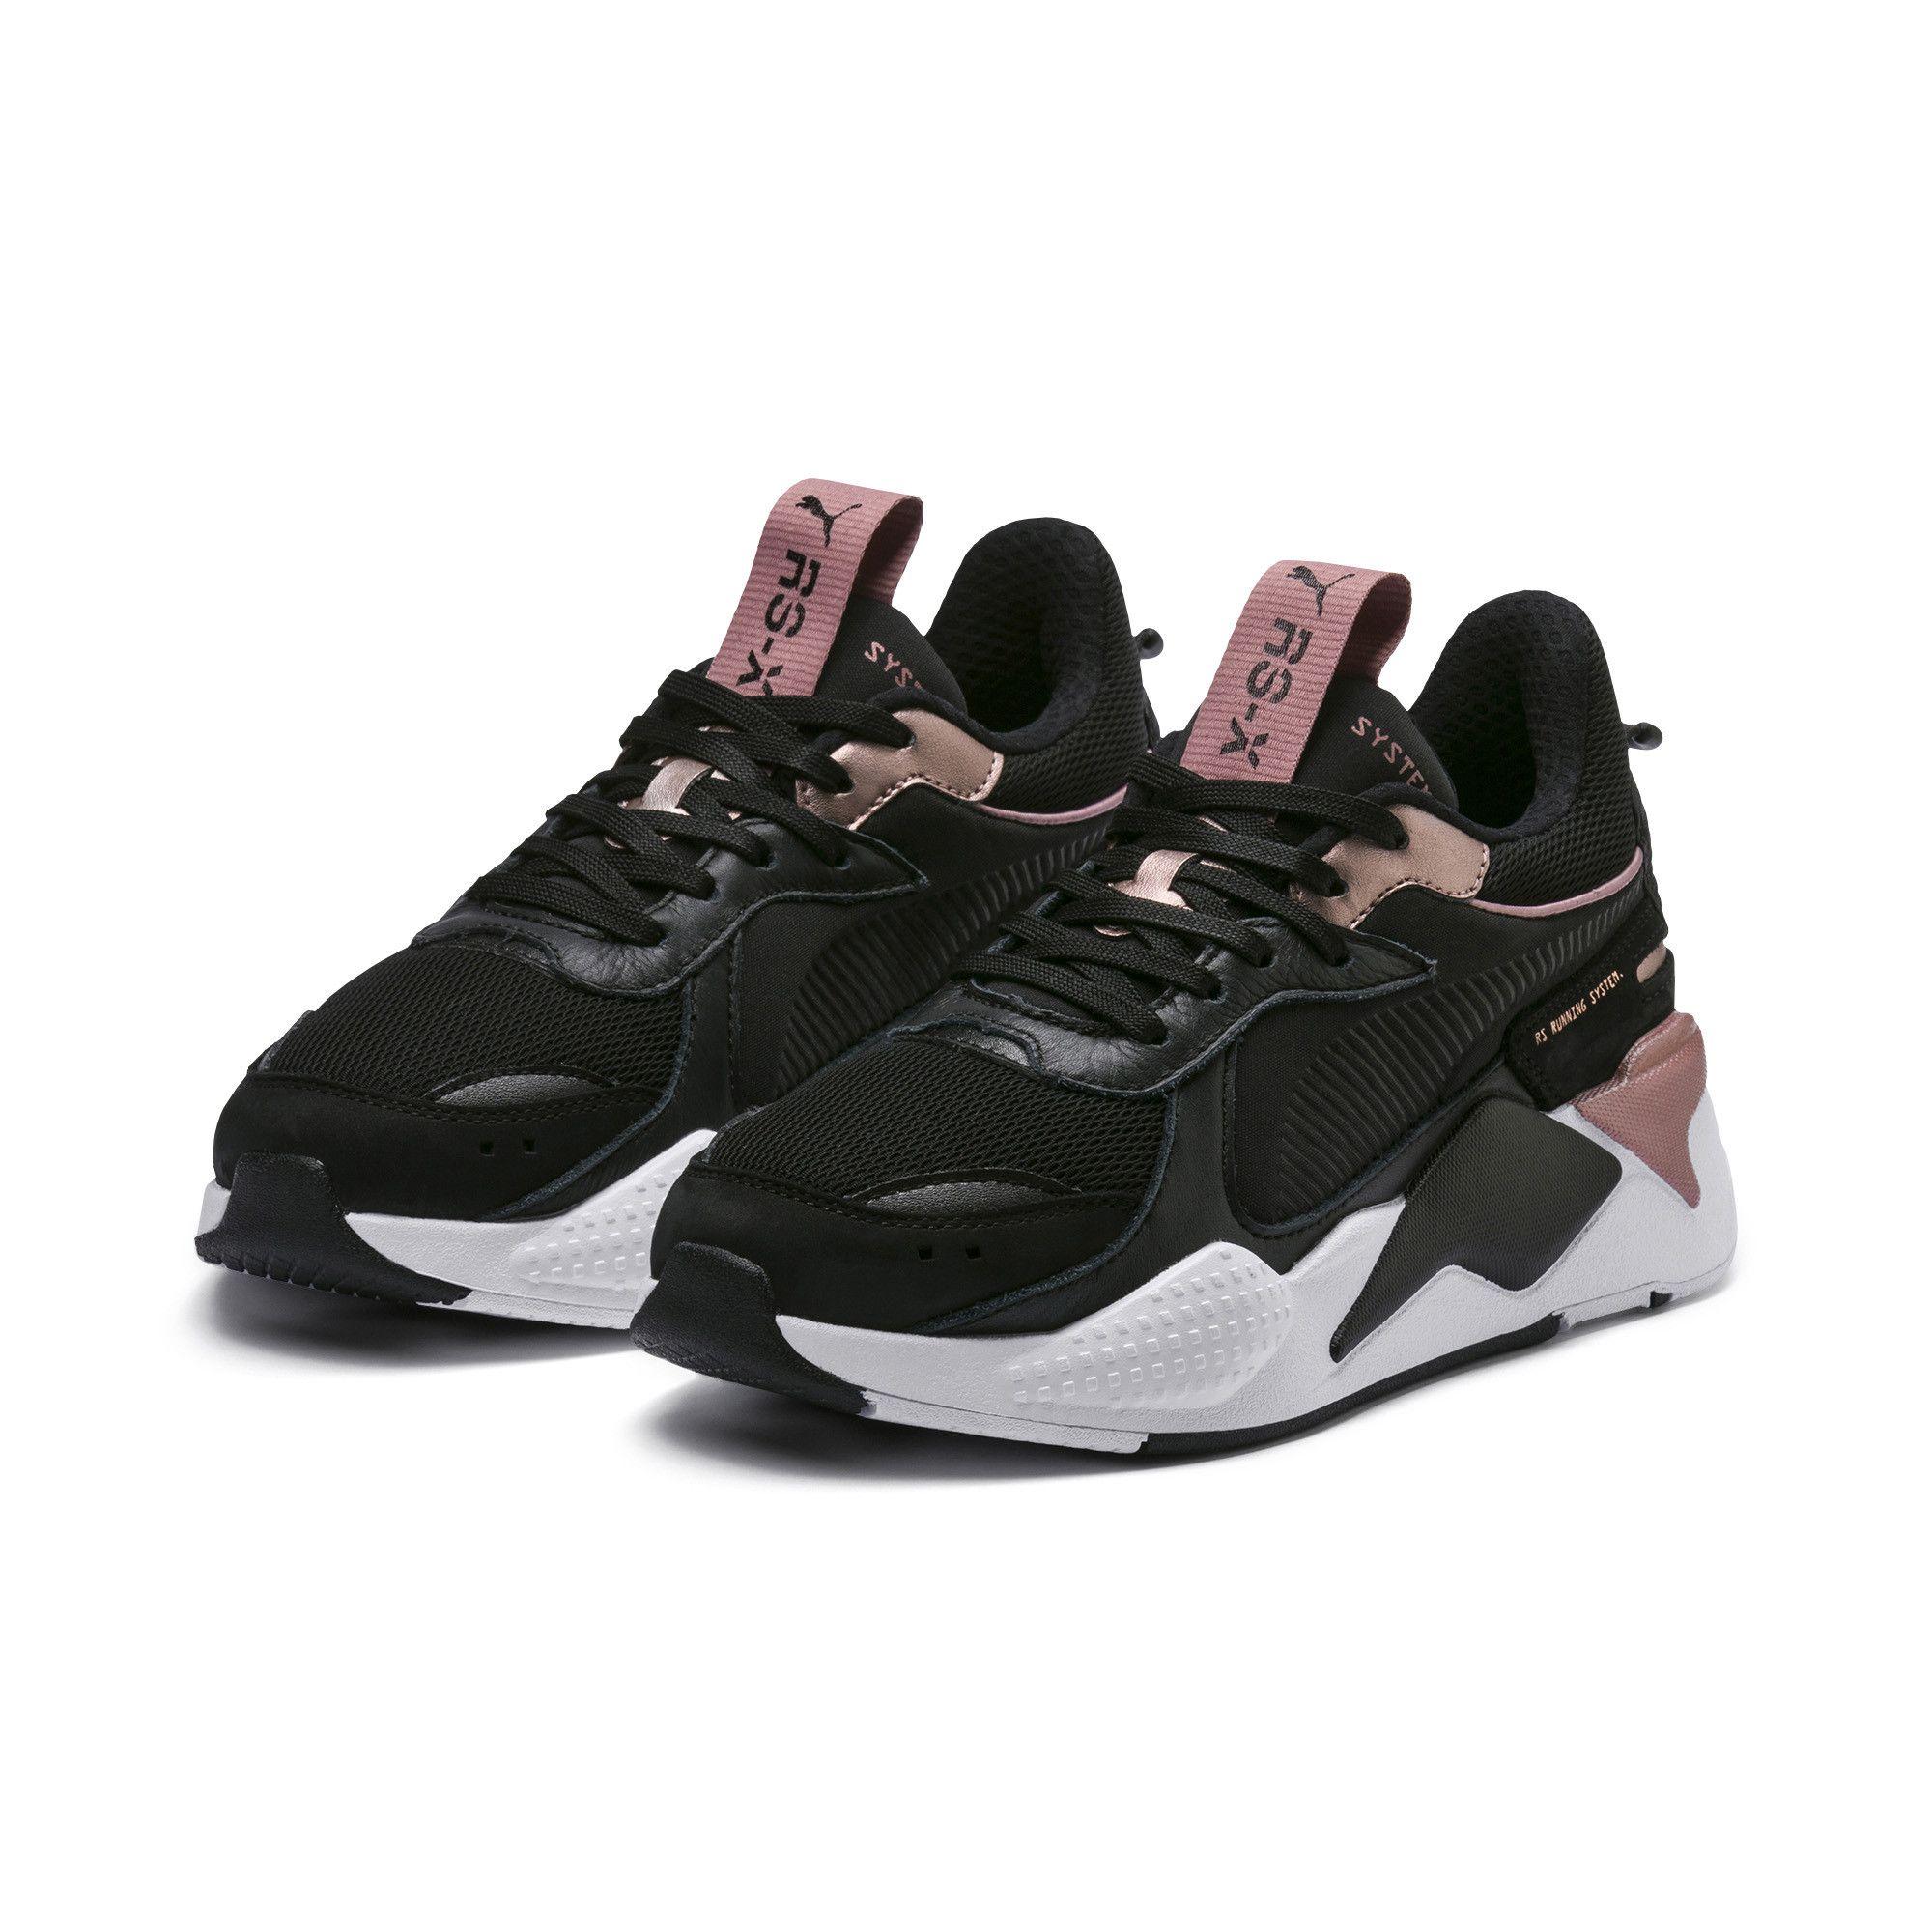 best sneakers 227f3 80d99 RS-X TROPHY Sneakers   Puma Black-Puma Team Gold   PUMA RS-X Collection    PUMA United Kingdom